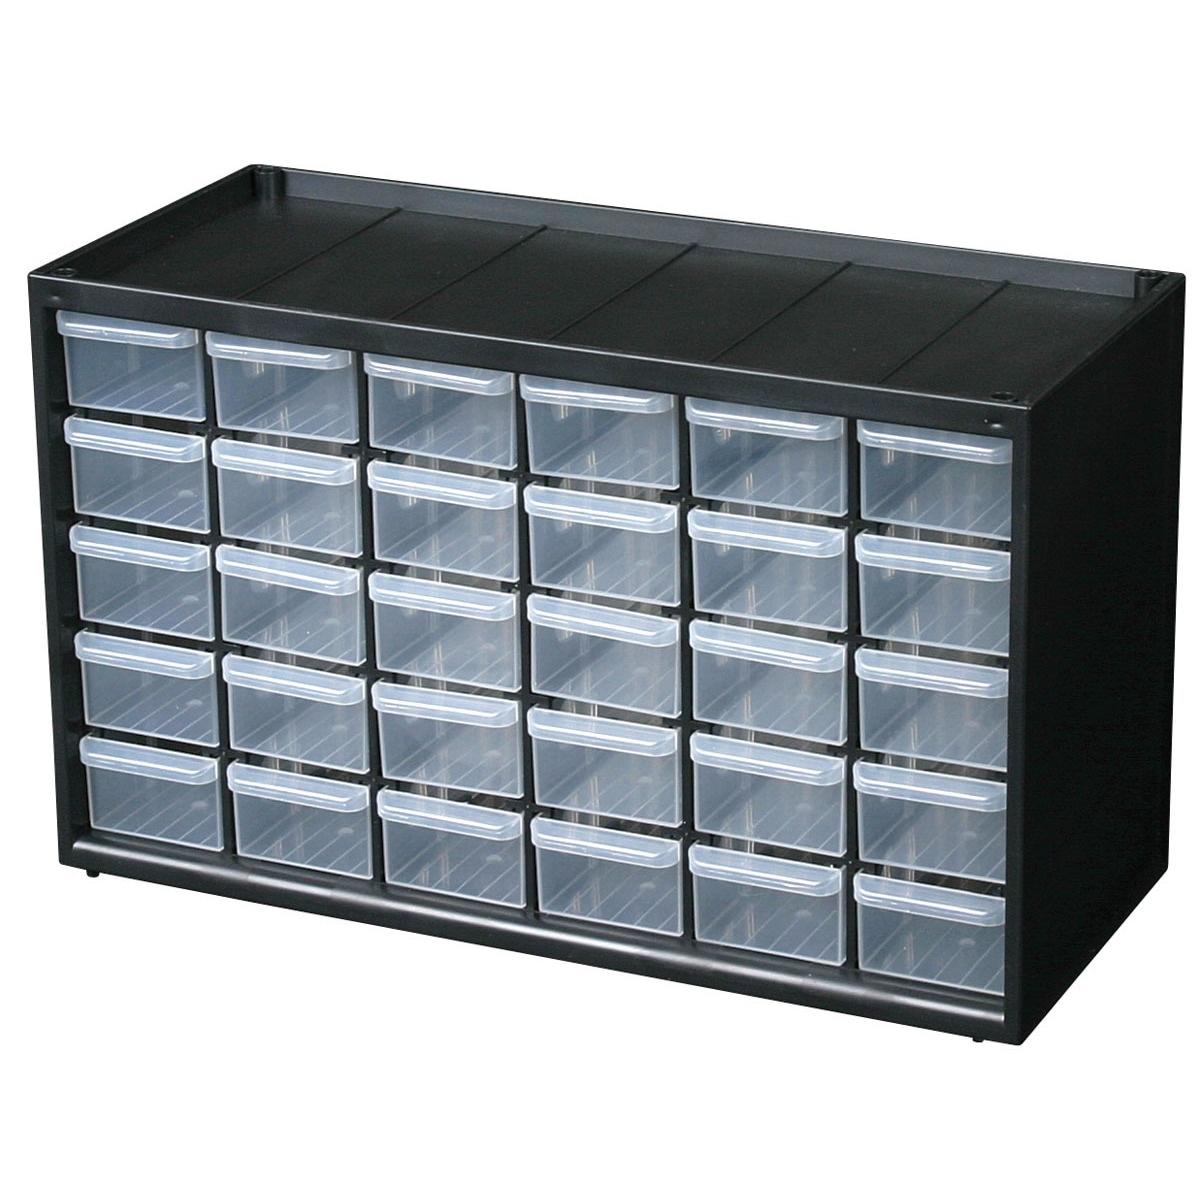 Flambeau Hardware 30 Uniform Compartments Storage Cabinet...